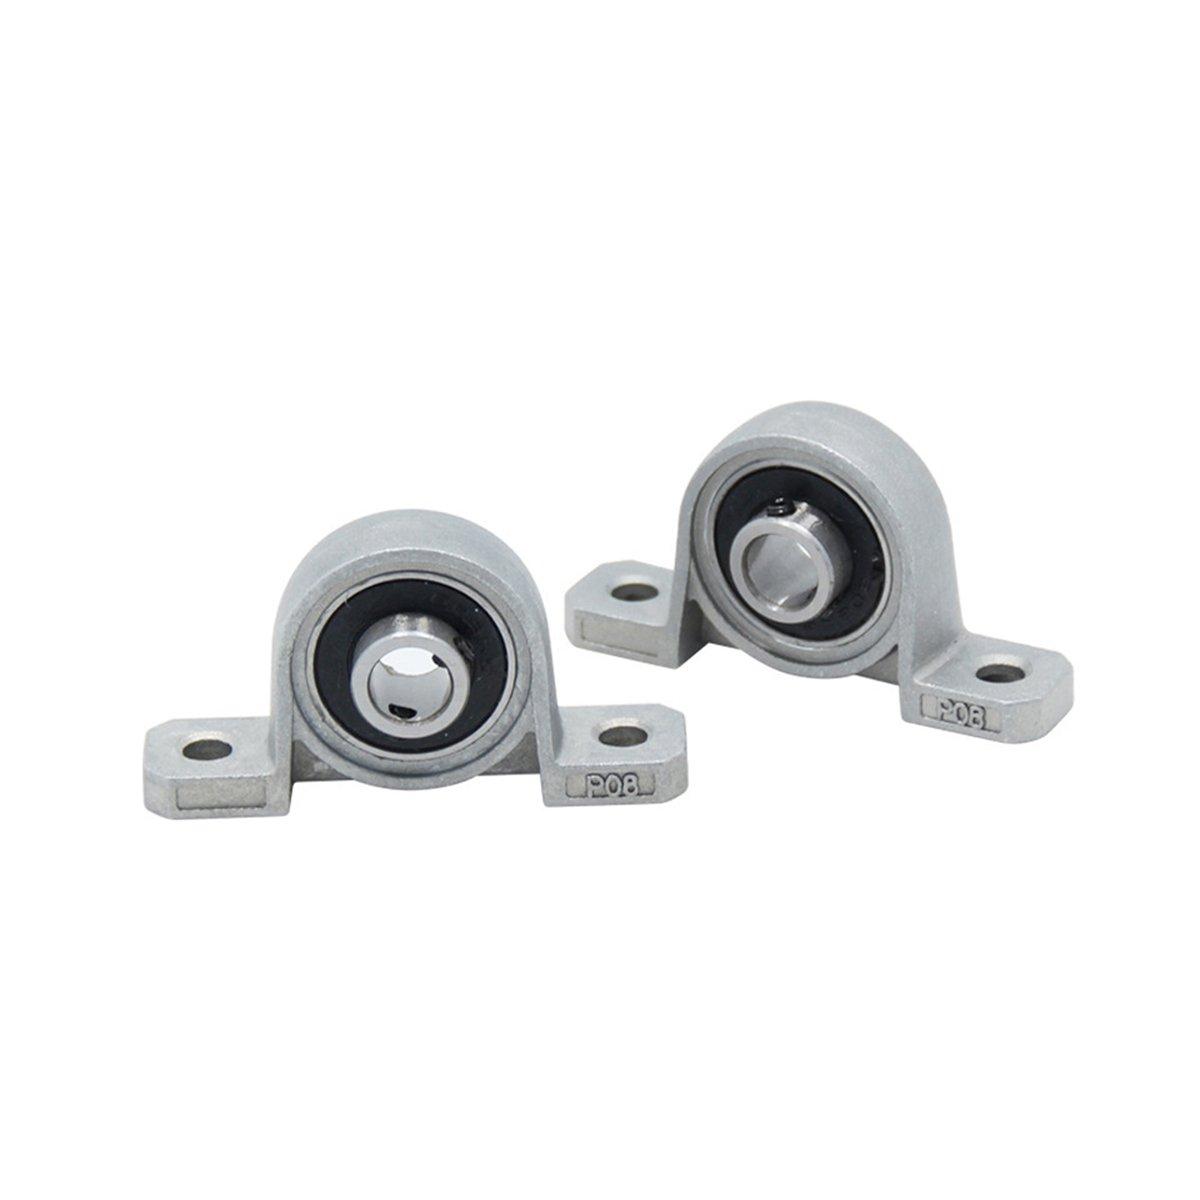 UEETEK 1 Pcs T8 8mm Inner Hole Horizontal Screw Rod Nut Shaft Mounting Support for 3D Printer,2.2 x 1.0 x 0.5 inch (L x W x H)